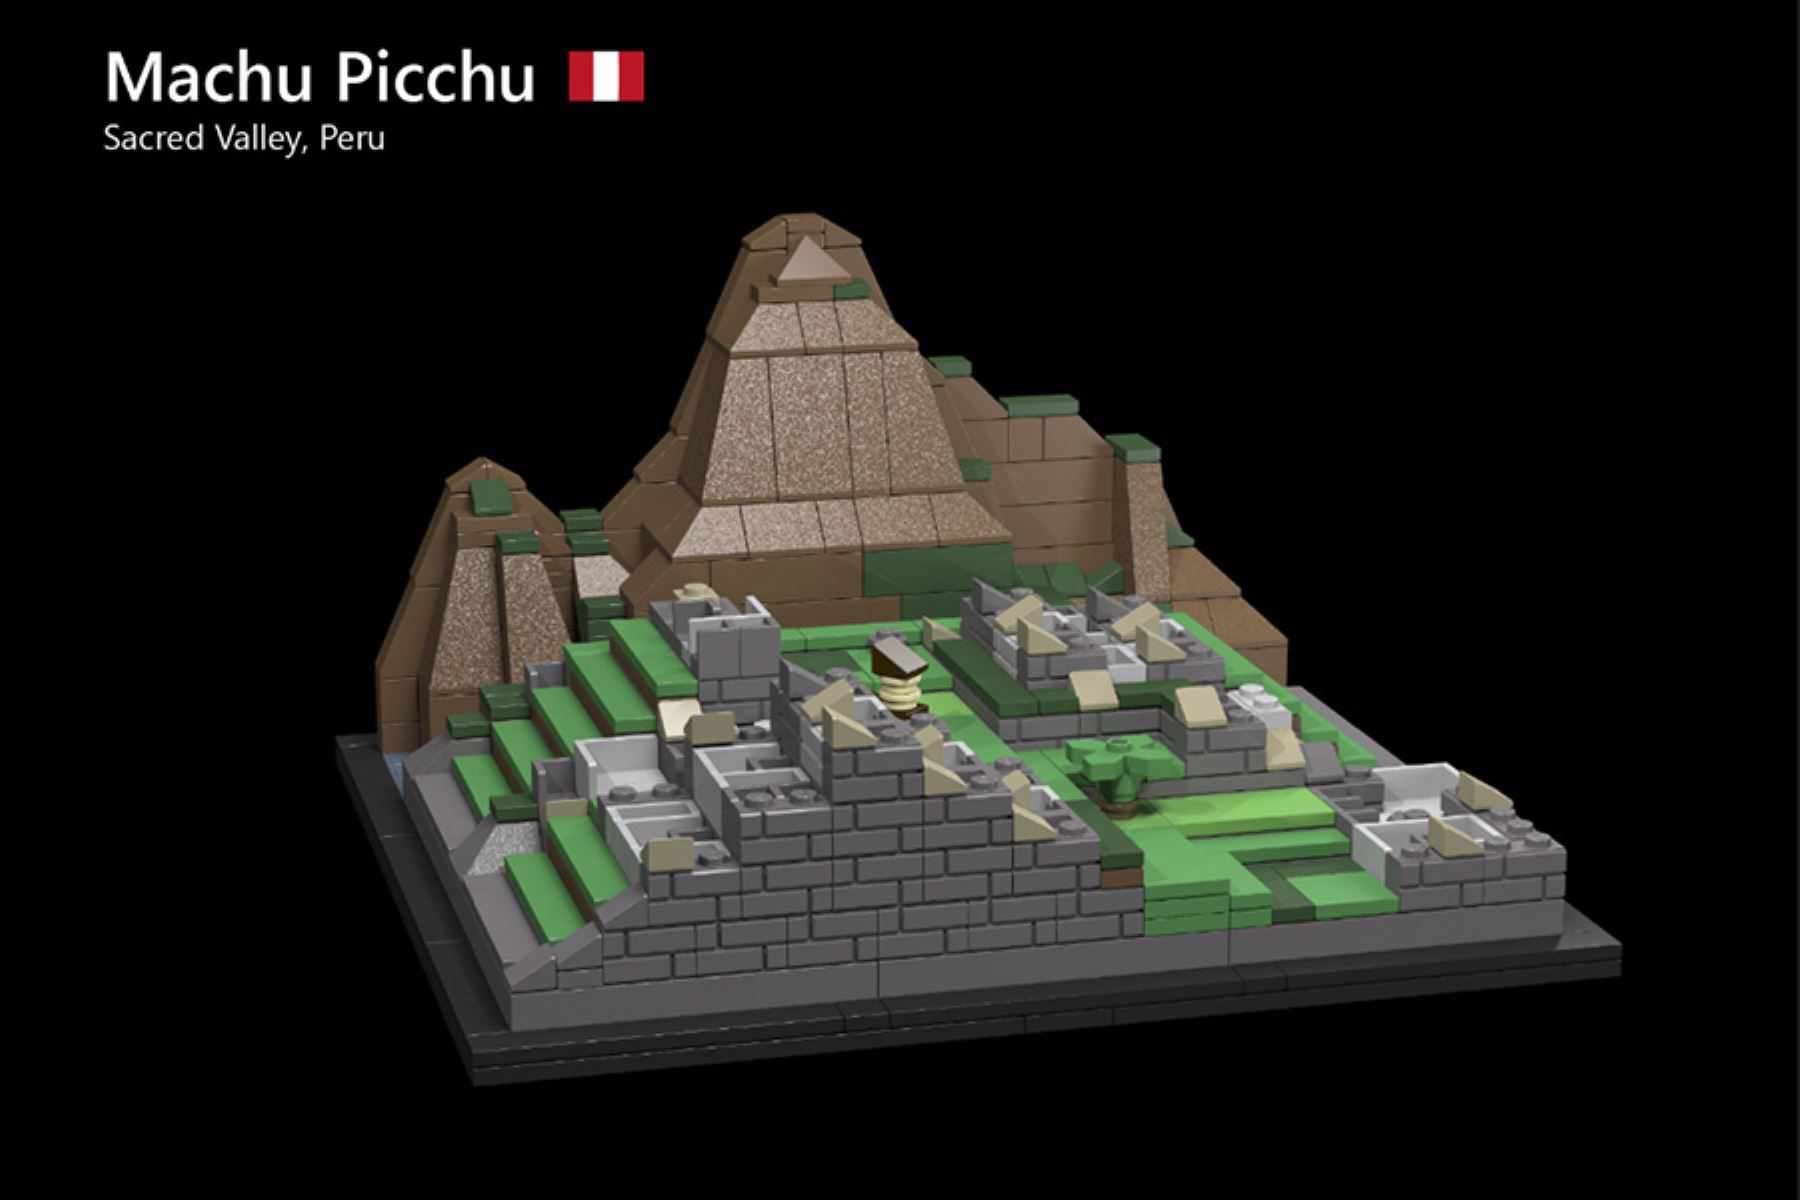 Machu Picchu celebra hoy 38 años como Santuario Histórico.